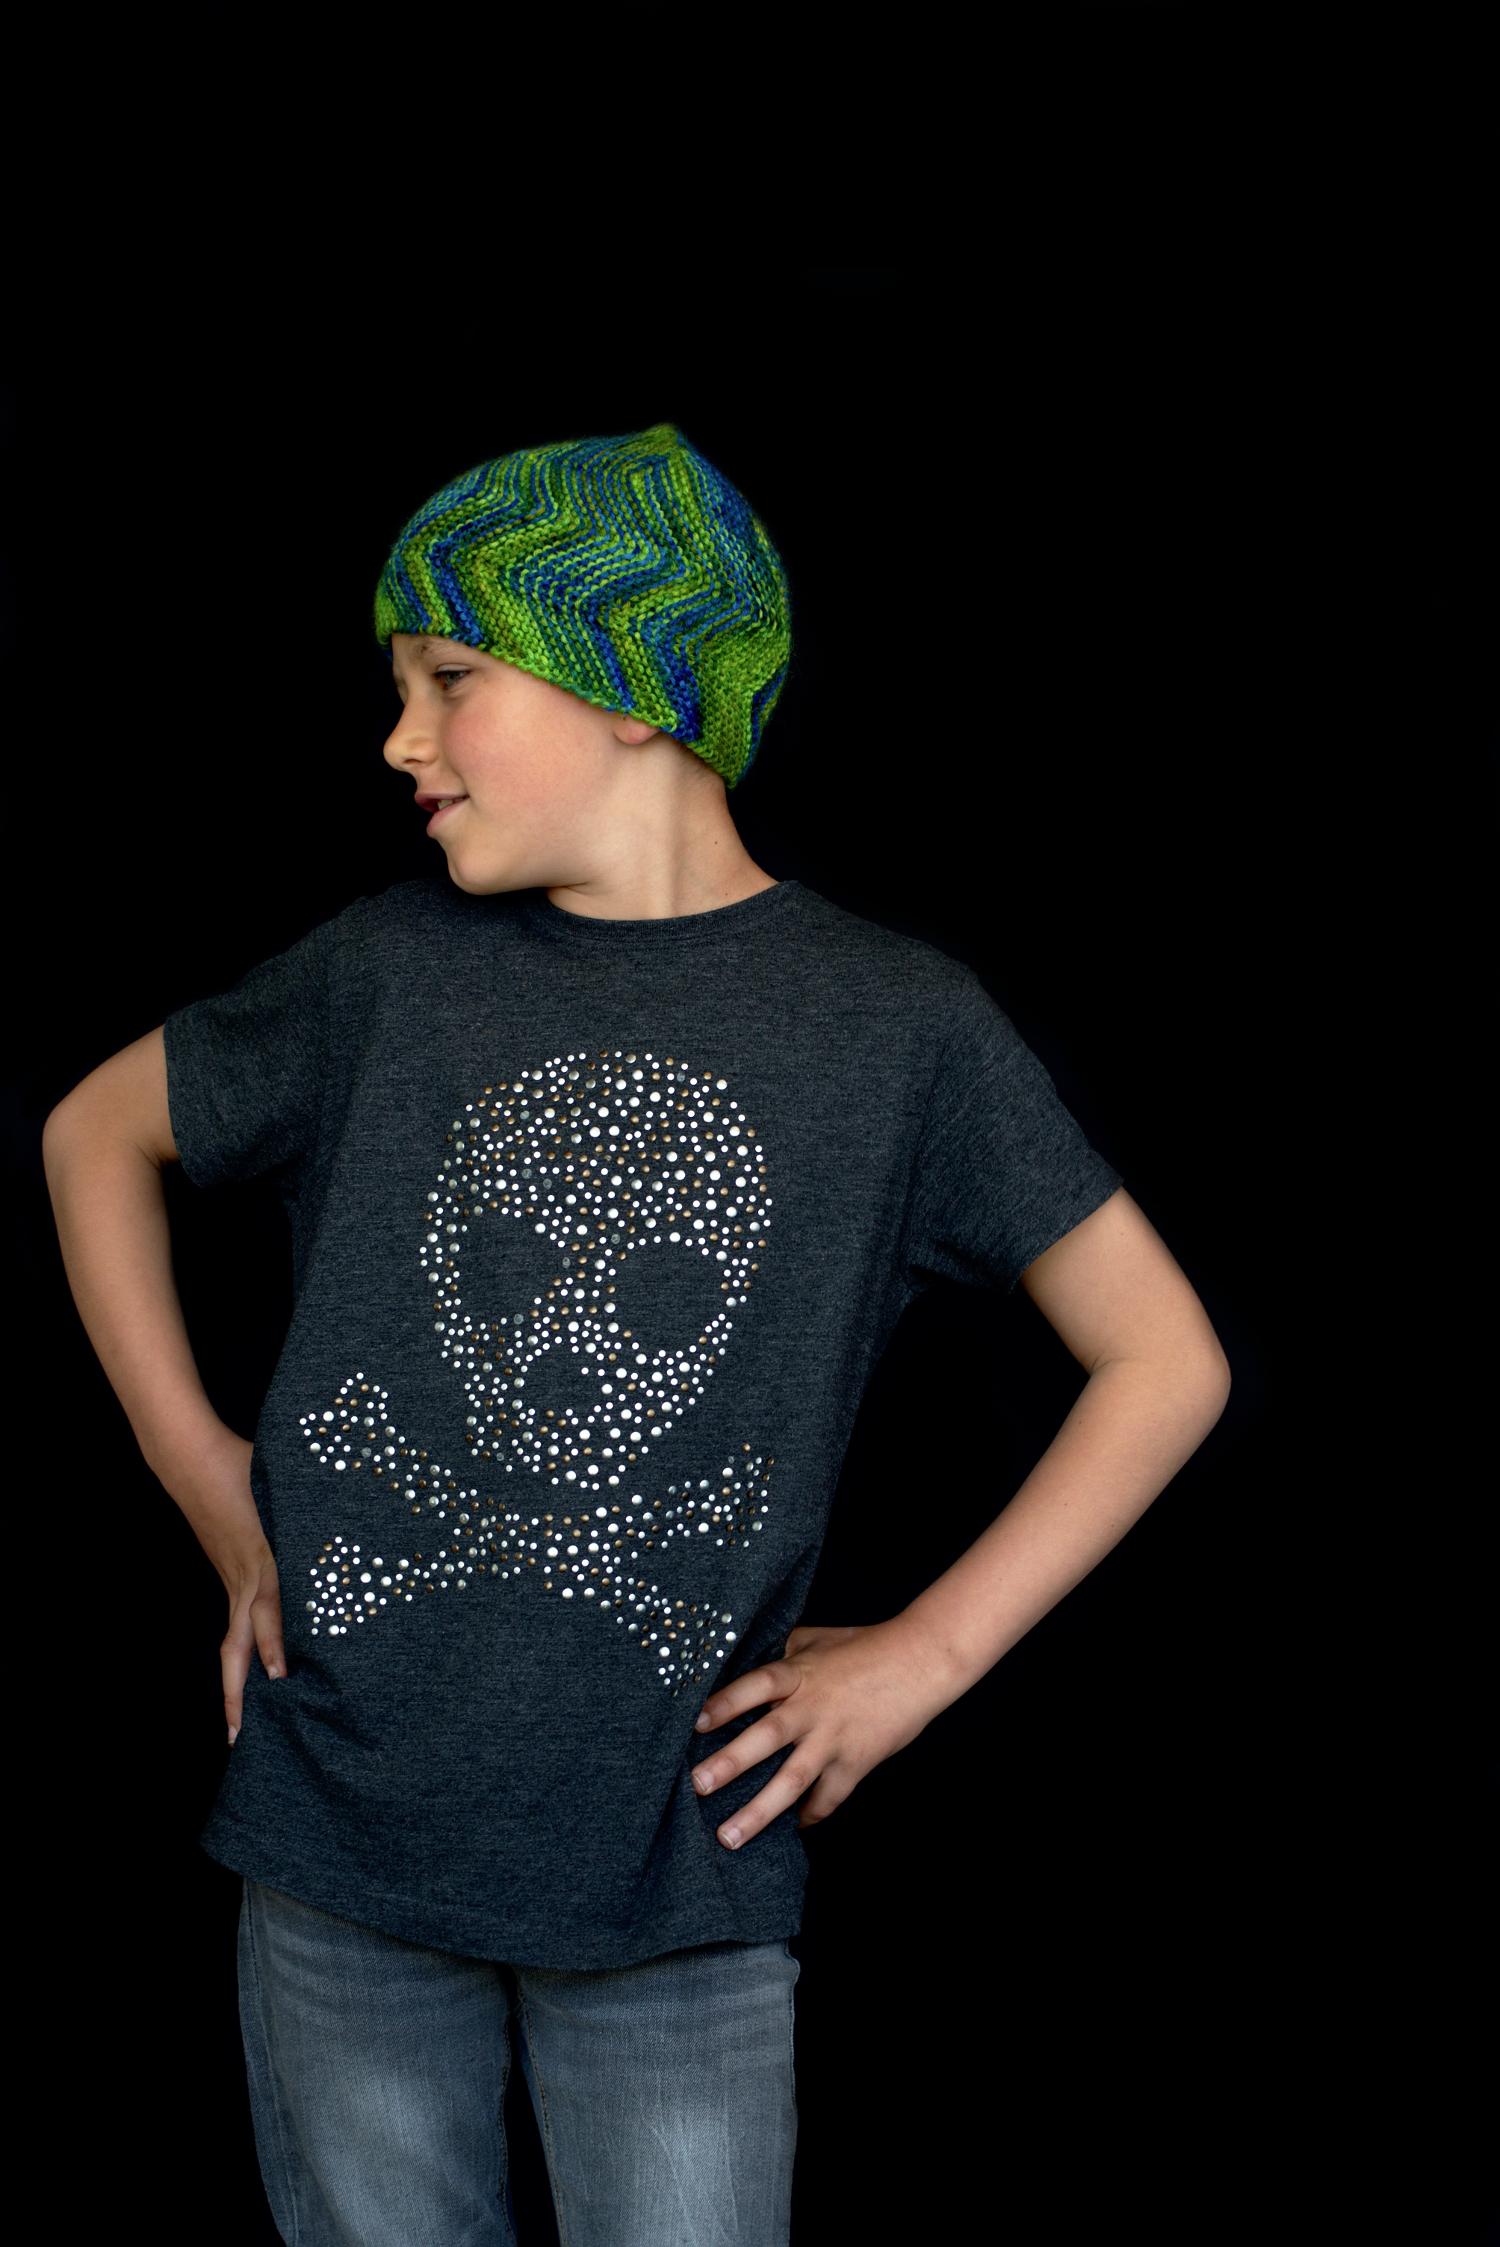 Mobberley hand knitting pattern for sideways knit pixie Hat